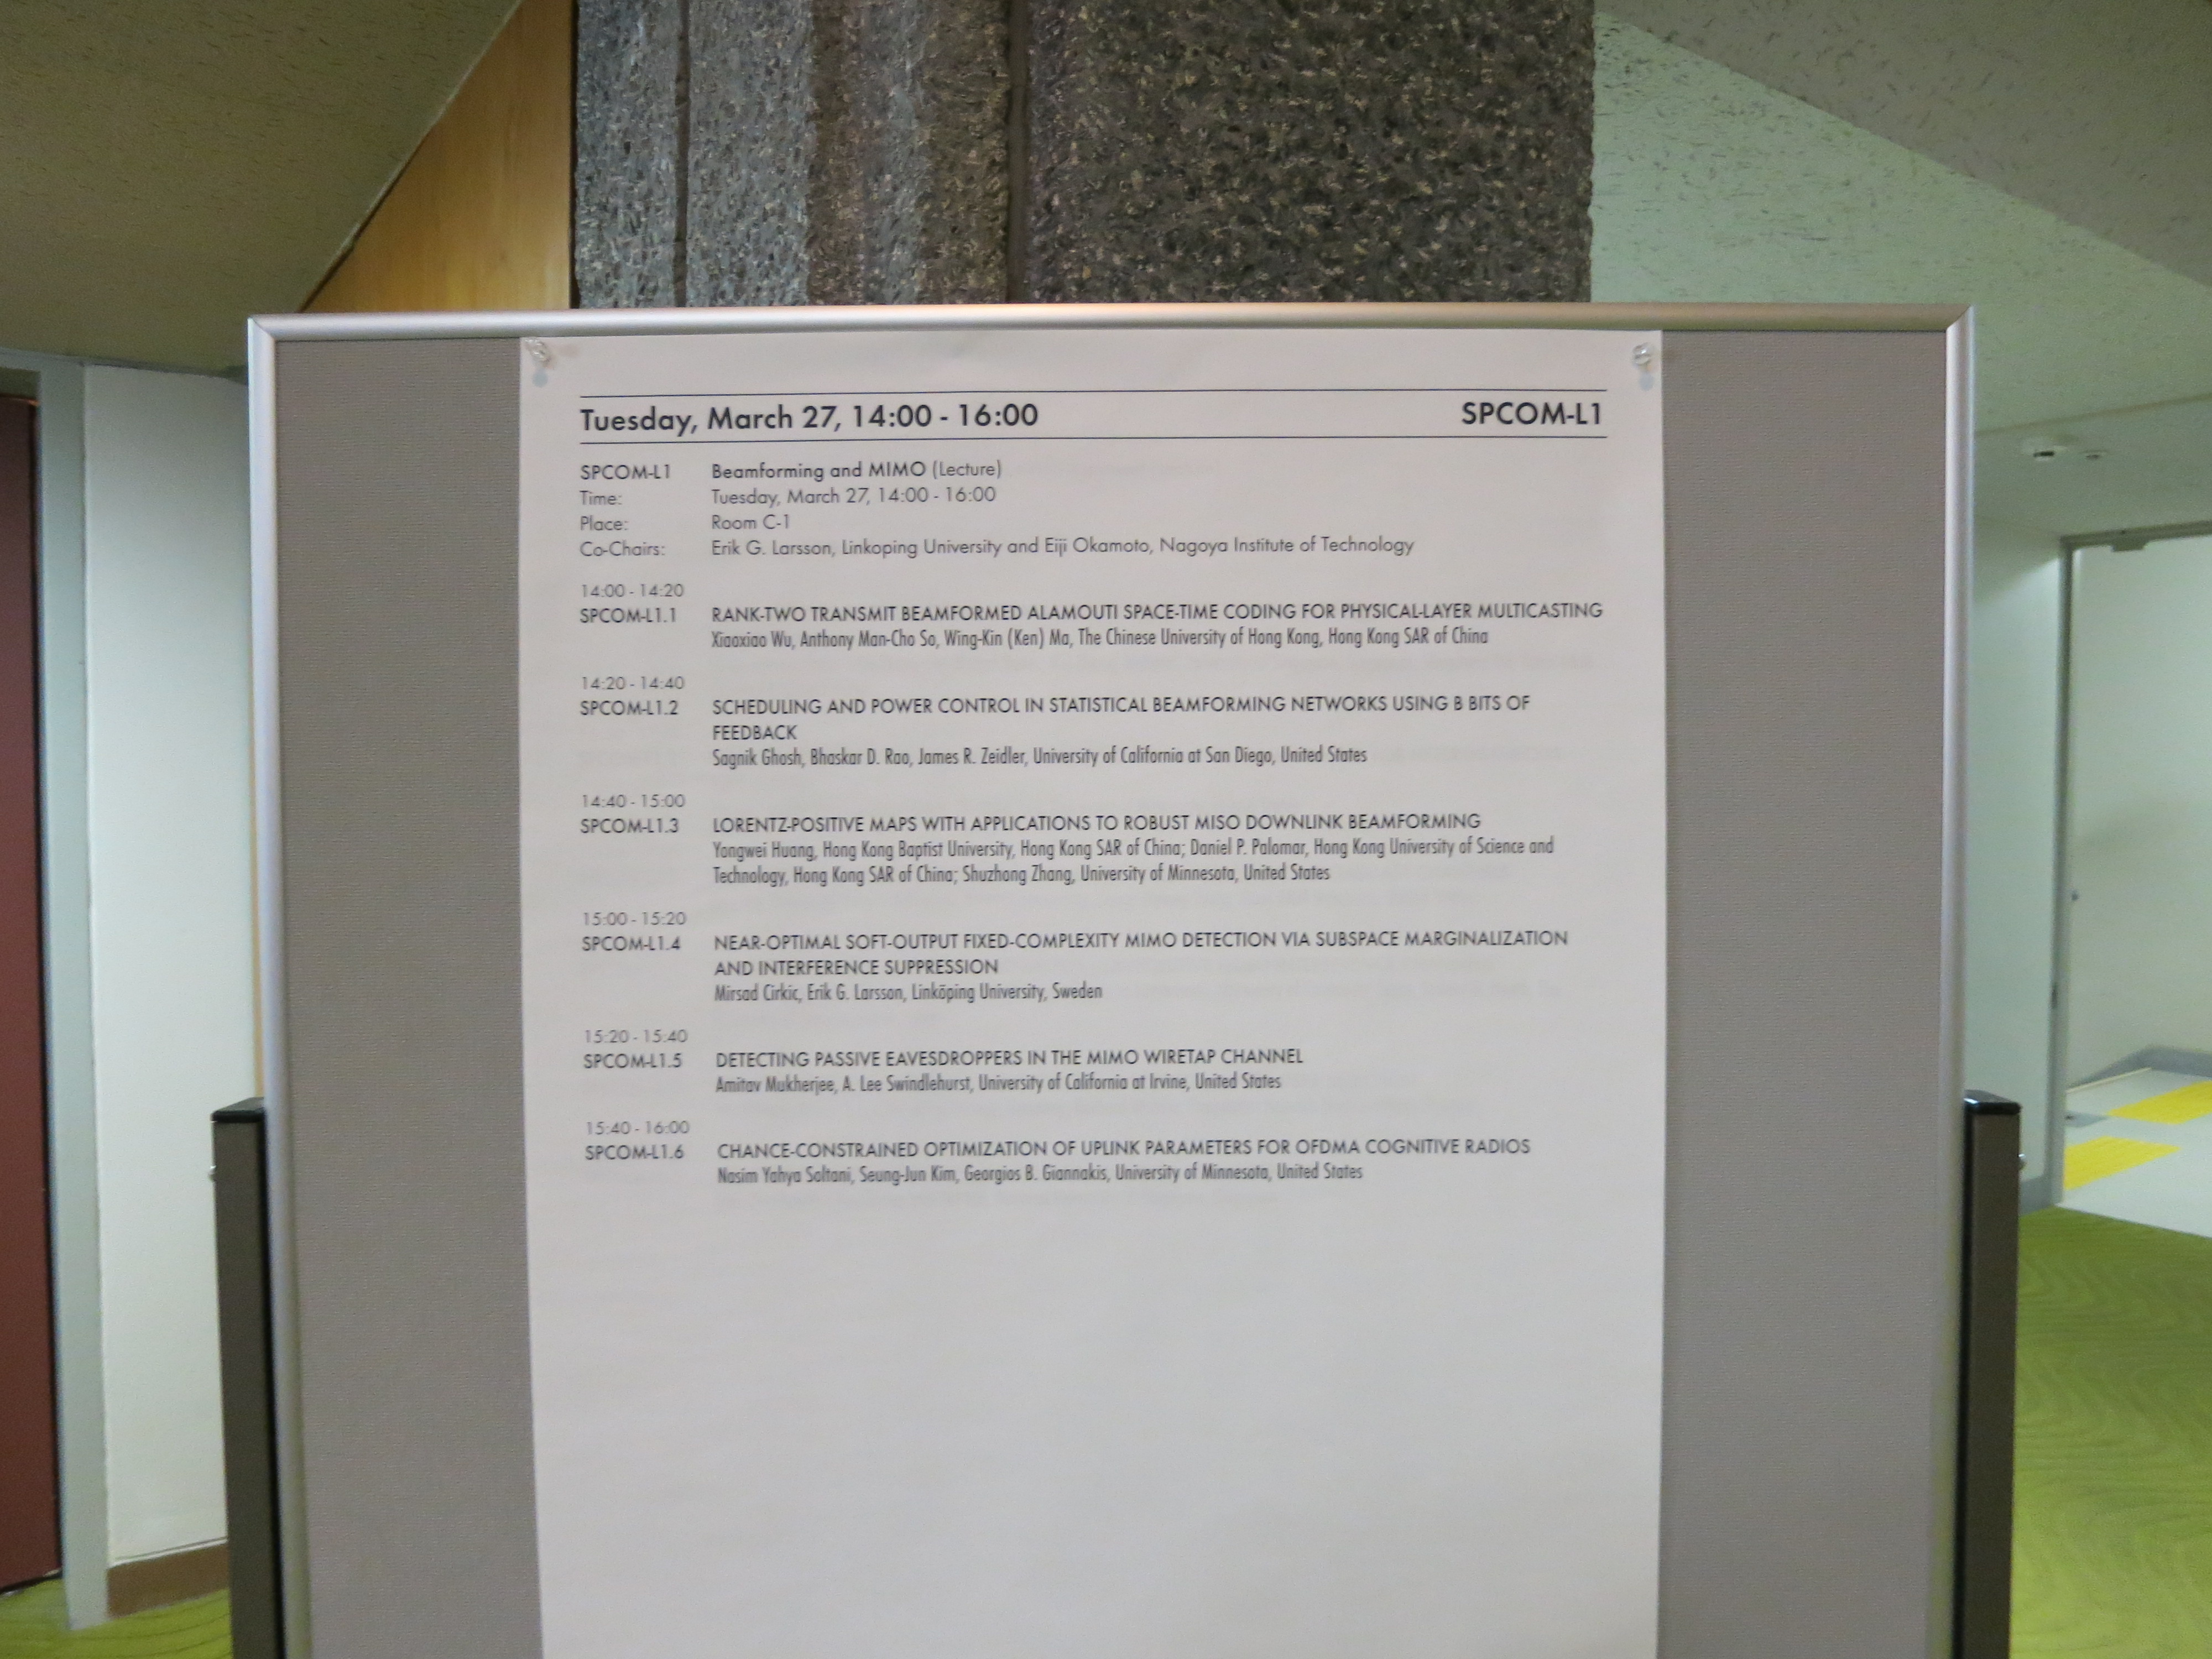 ICASSP 2012 Photo Gallery